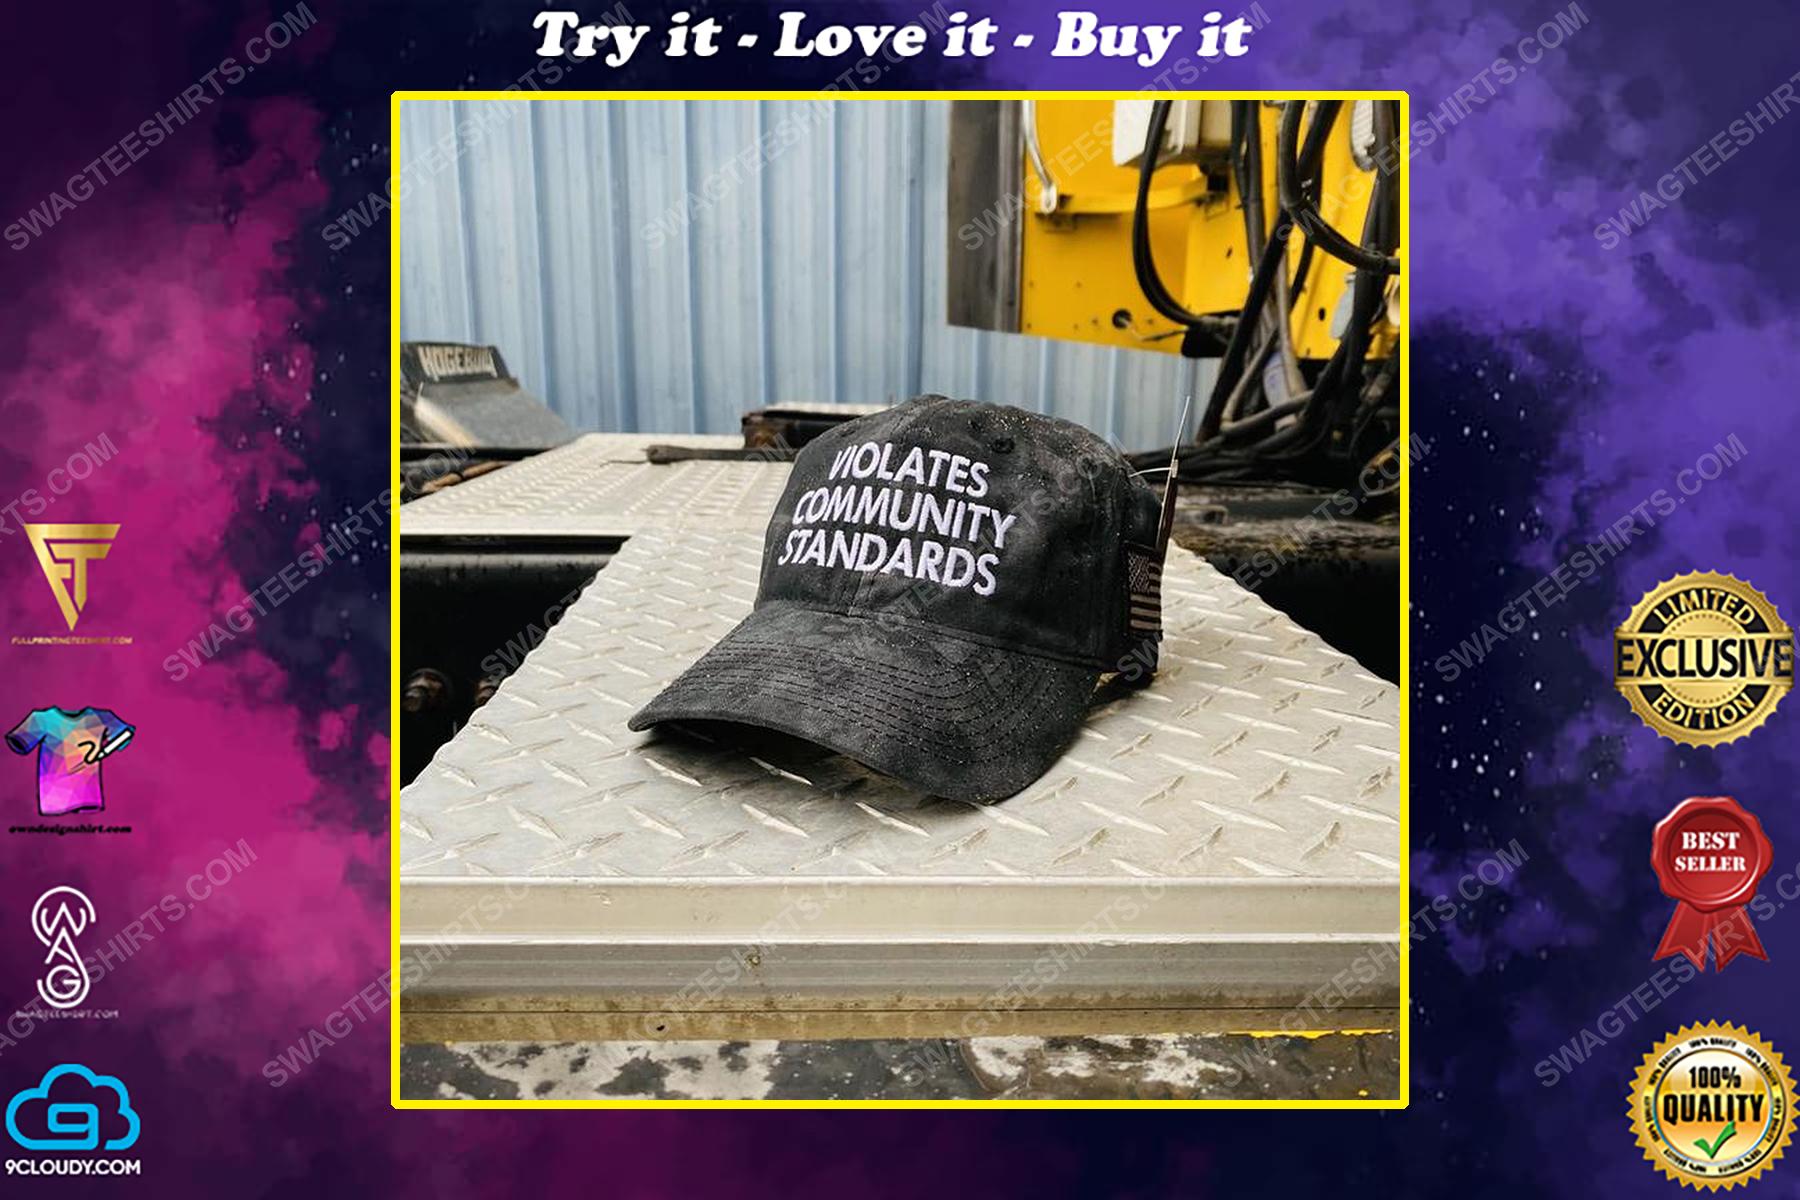 Violates community standards full print classic hat